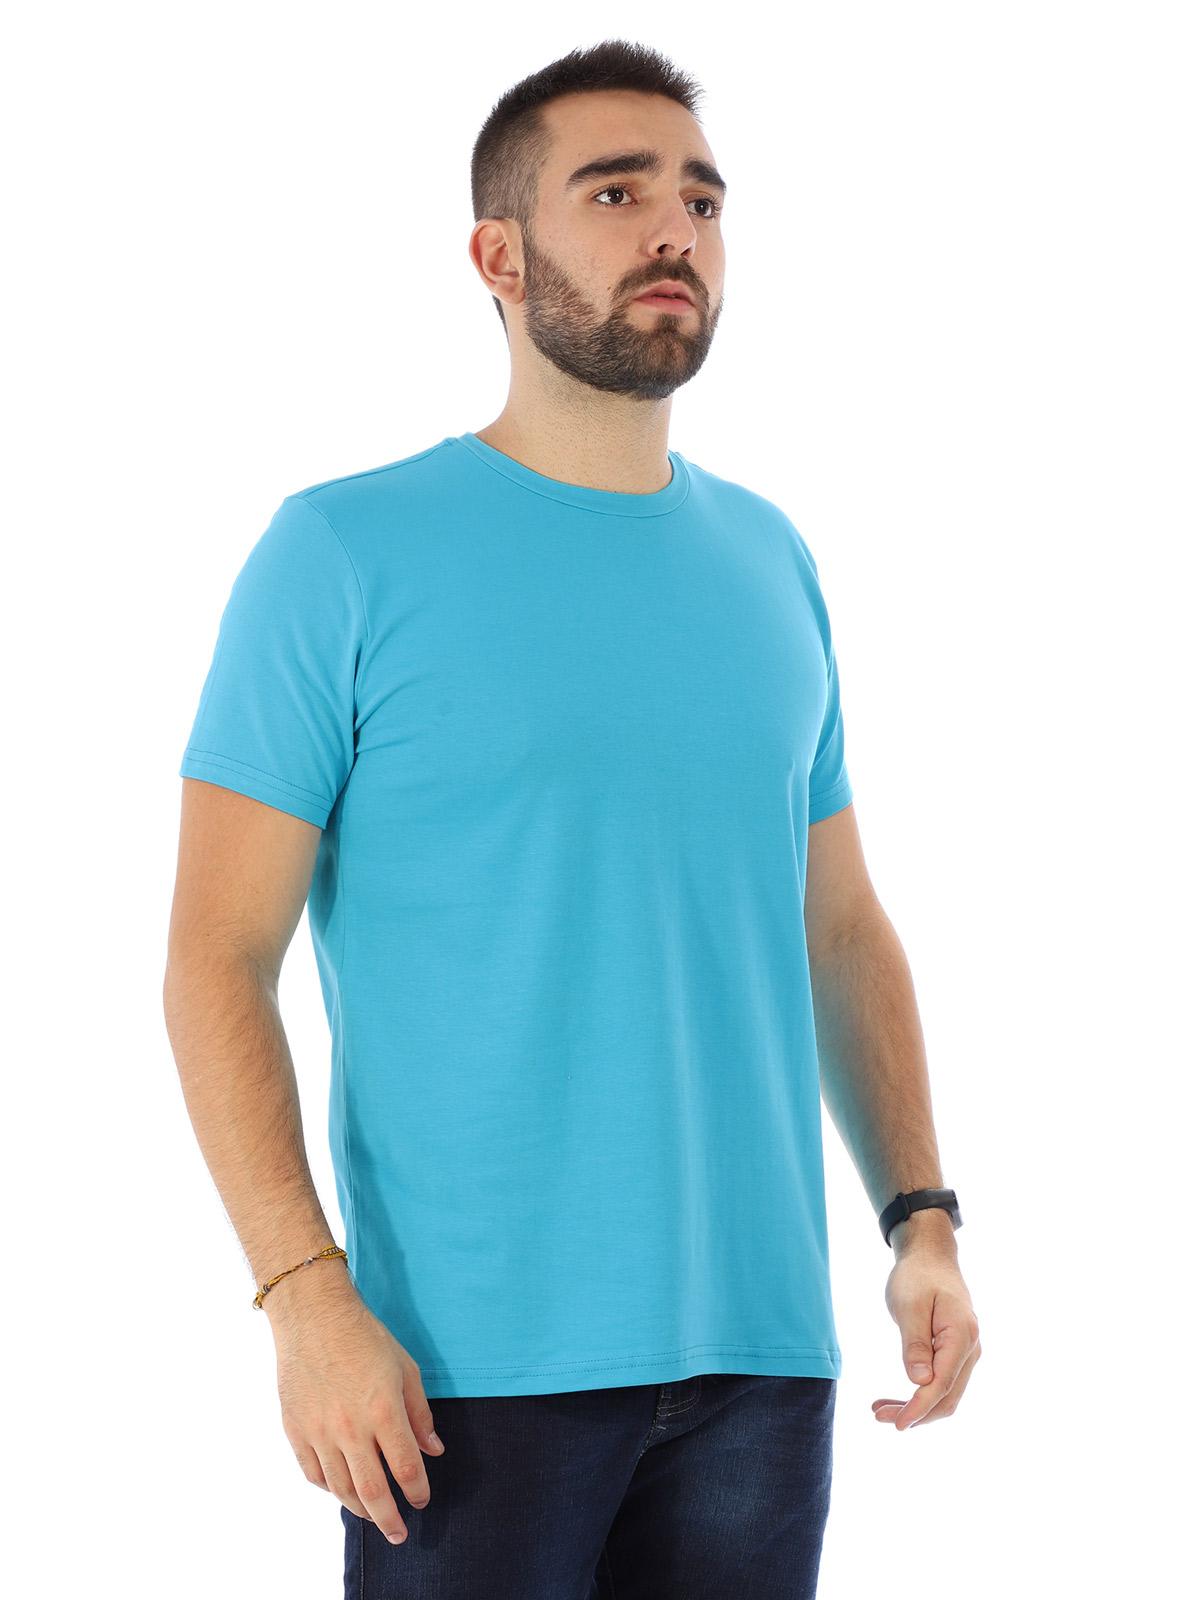 Camiseta Masculina Lisa Algodão Com Elastano Fit Turquesa